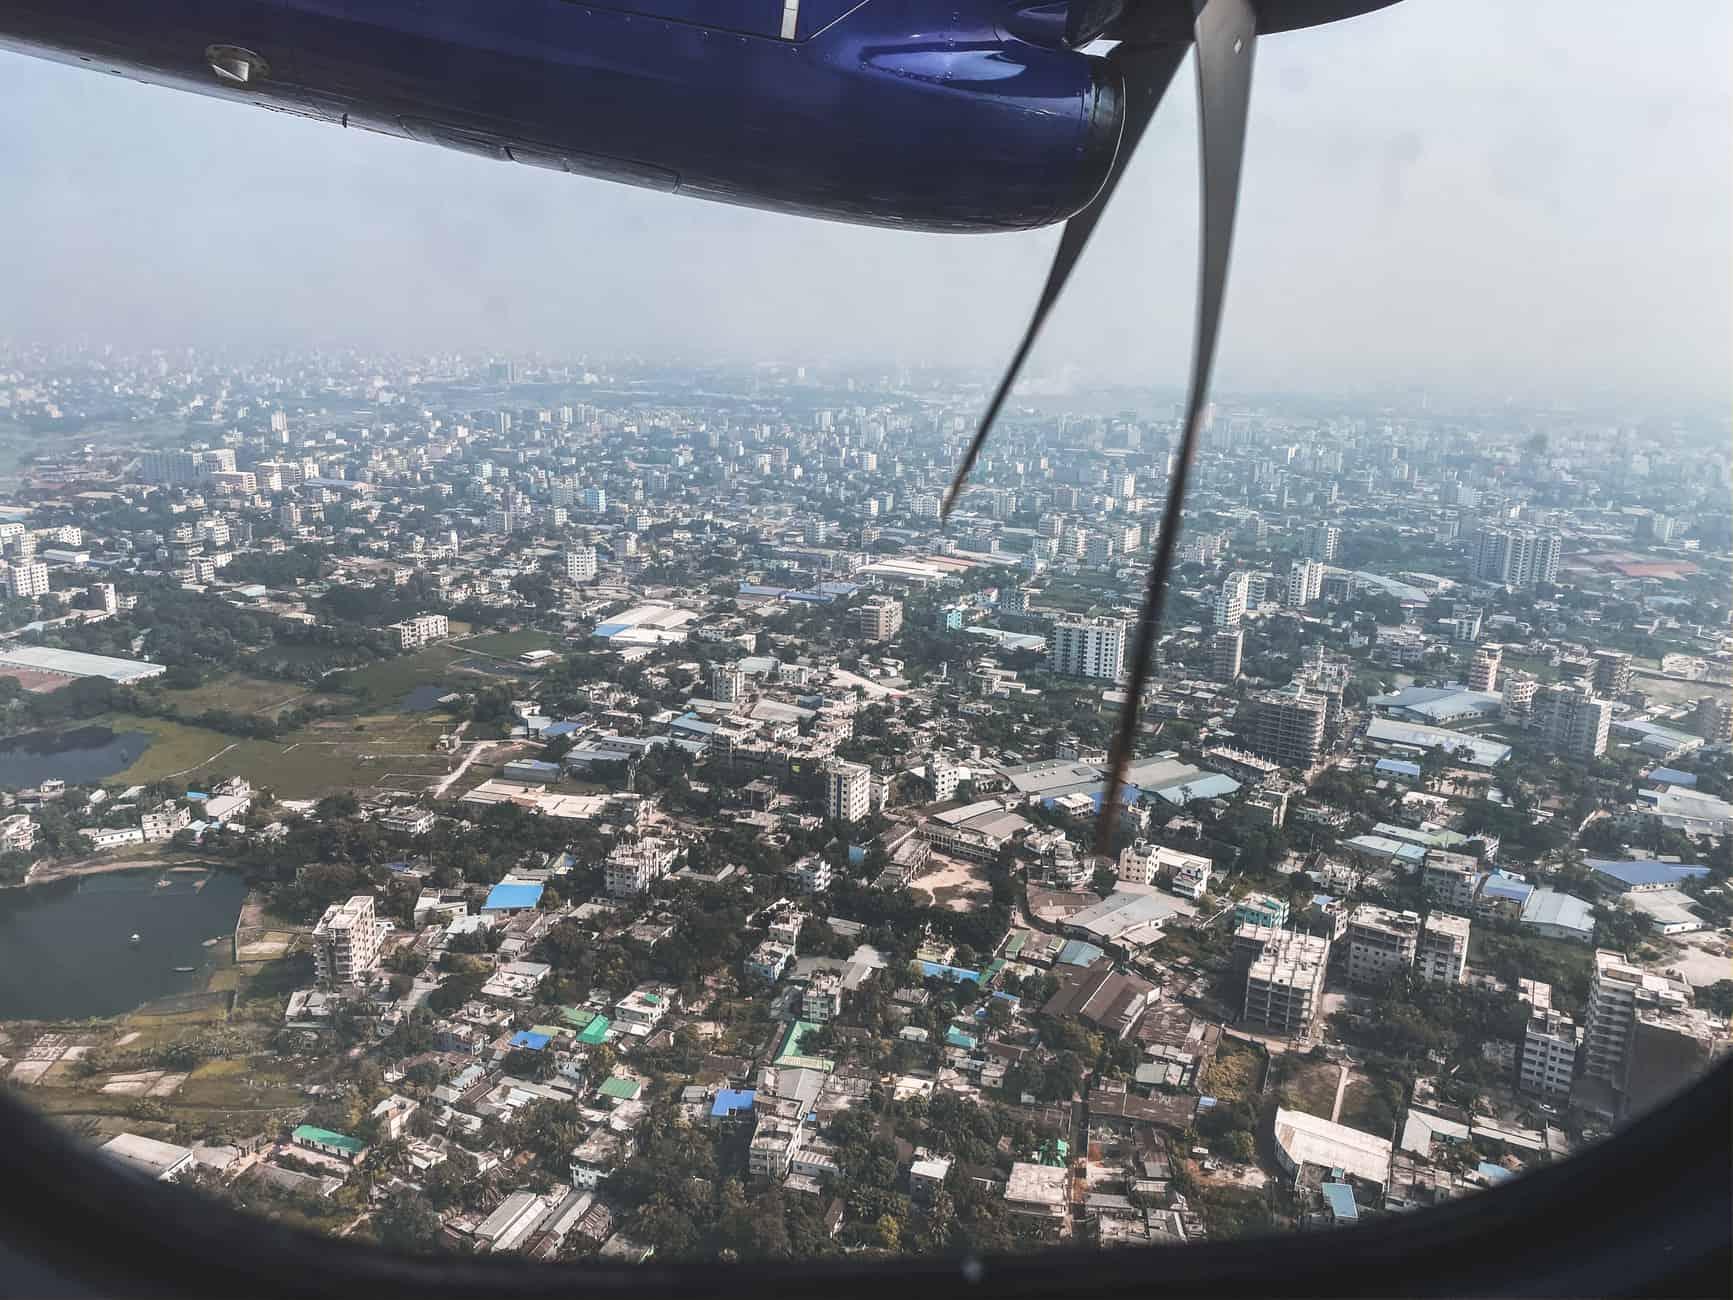 Things to do on a layover in Dhaka: 8-12 hours in Dhaka, Bangladesh